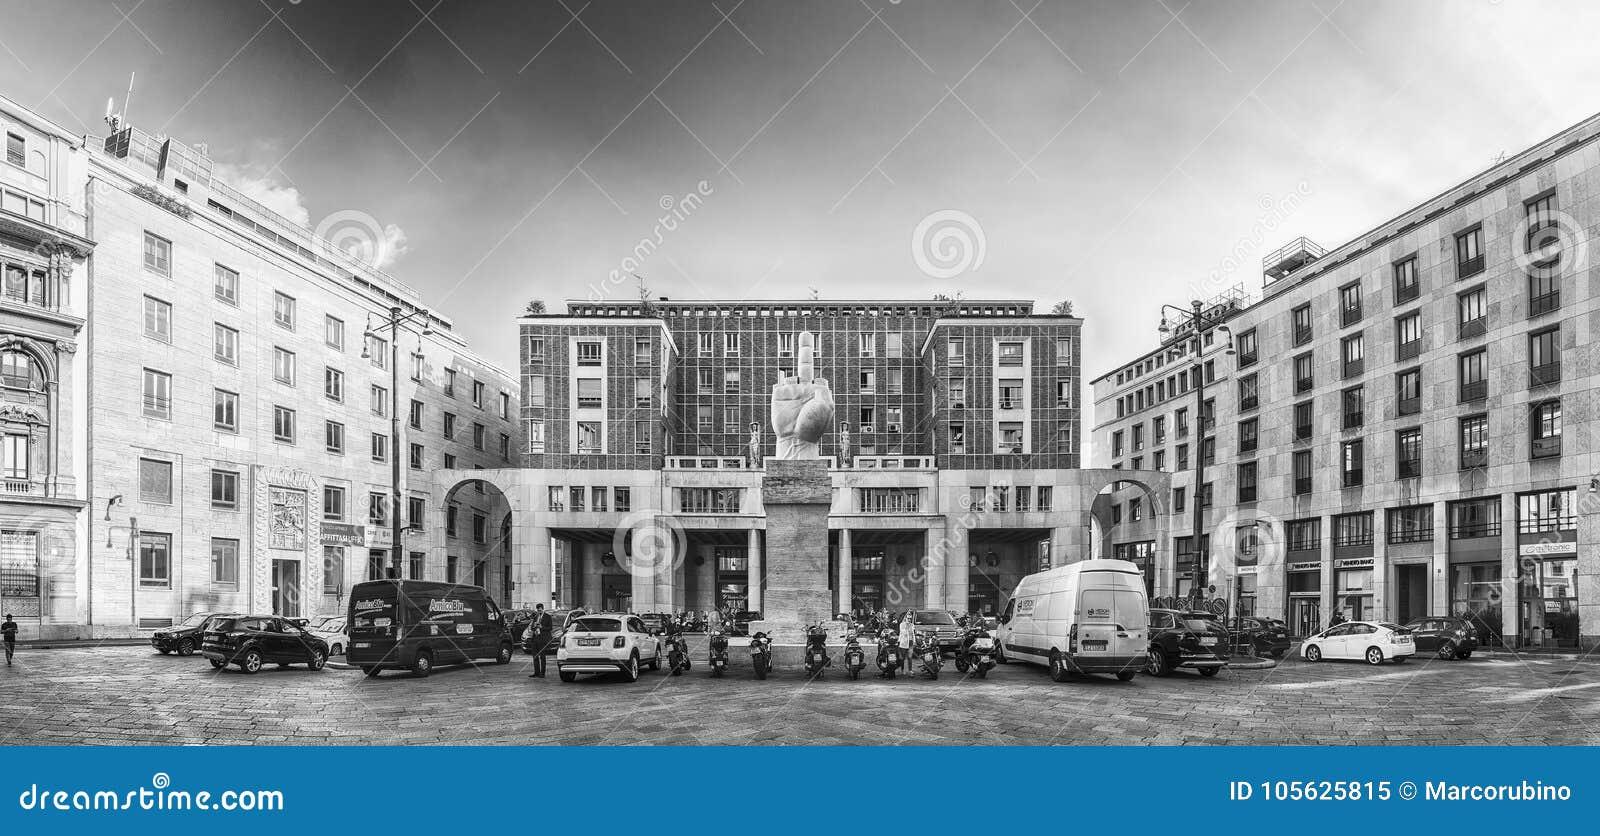 16c99ac7cc MILAN - SEPTEMBER 11: Panoramic view of Piazza Affari (in english: Business  Square), Milan, Italy, on September 11, 2017